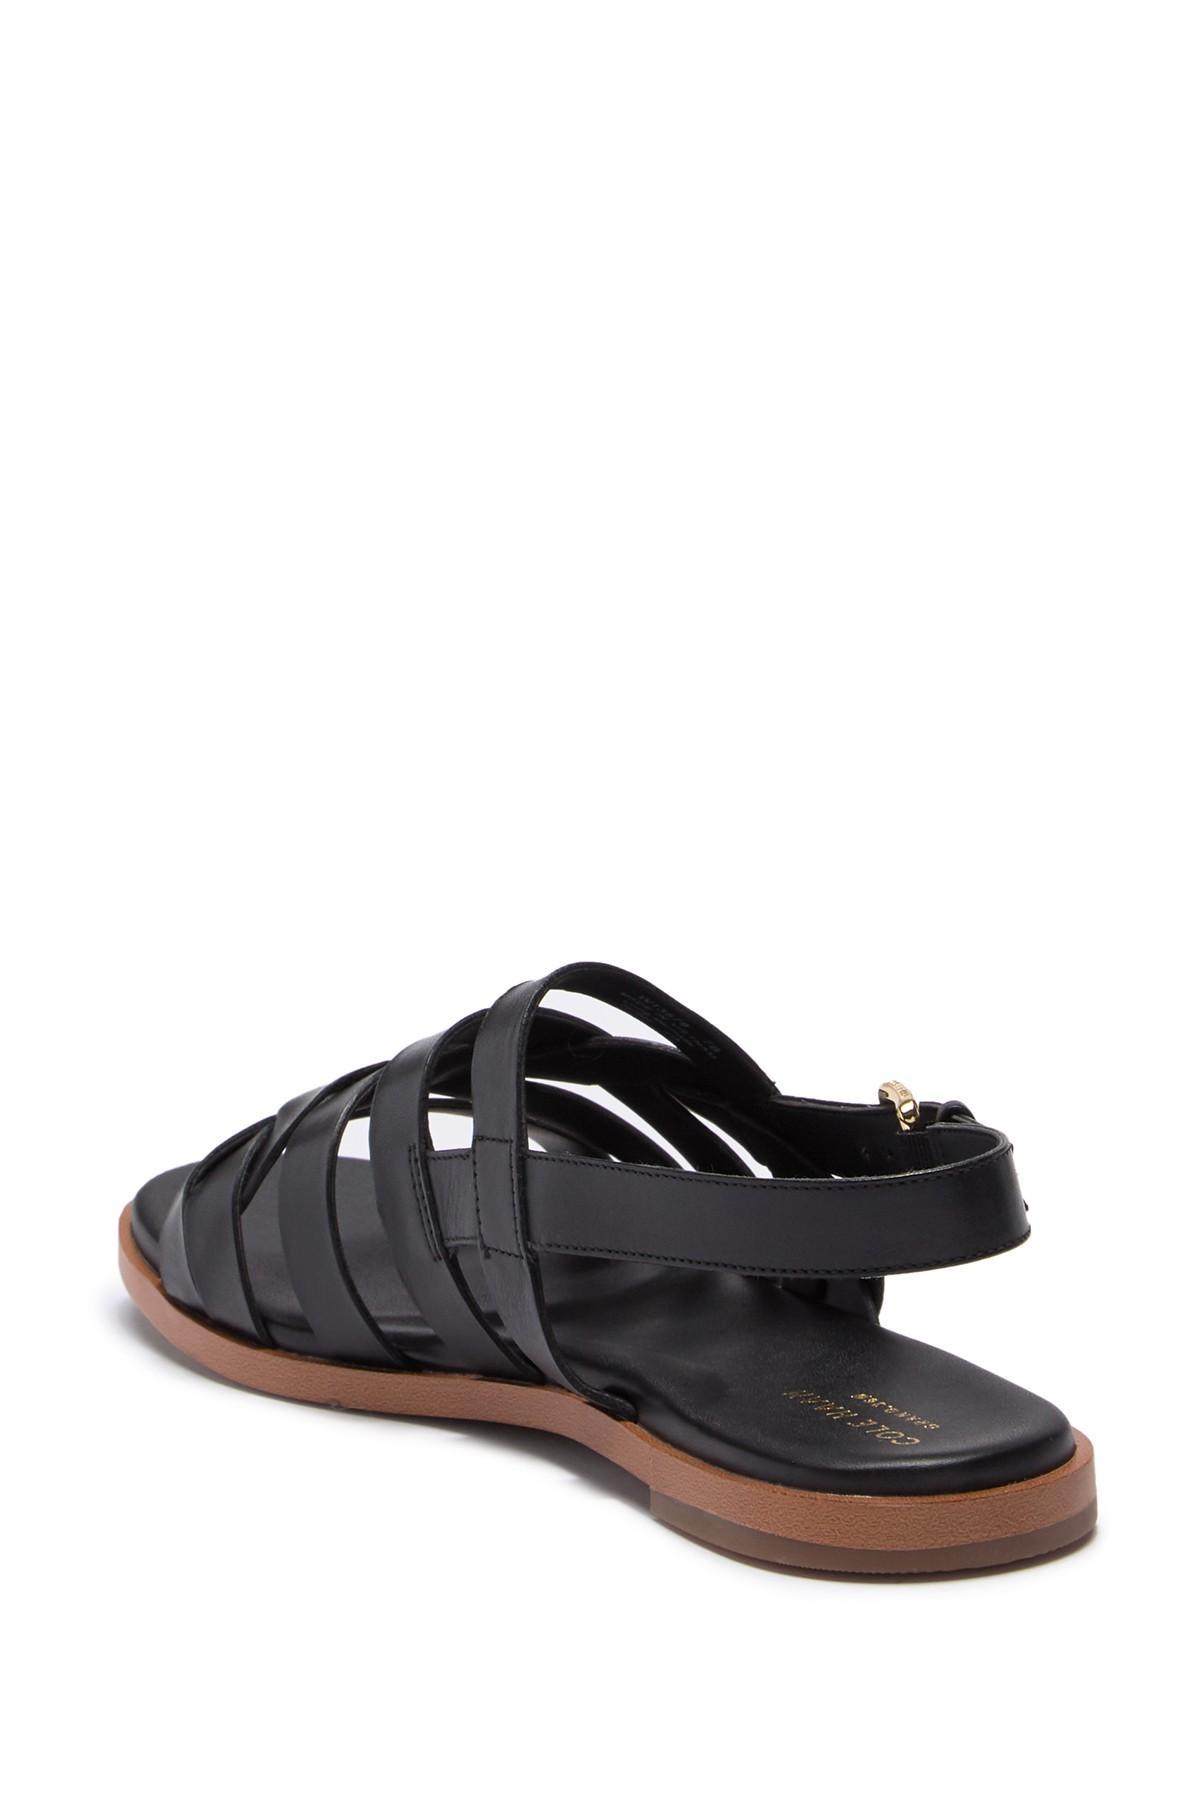 6c6db6072b03 Cole Haan - Black Braelyn Grand Braided Flat Sandal - Lyst. View fullscreen